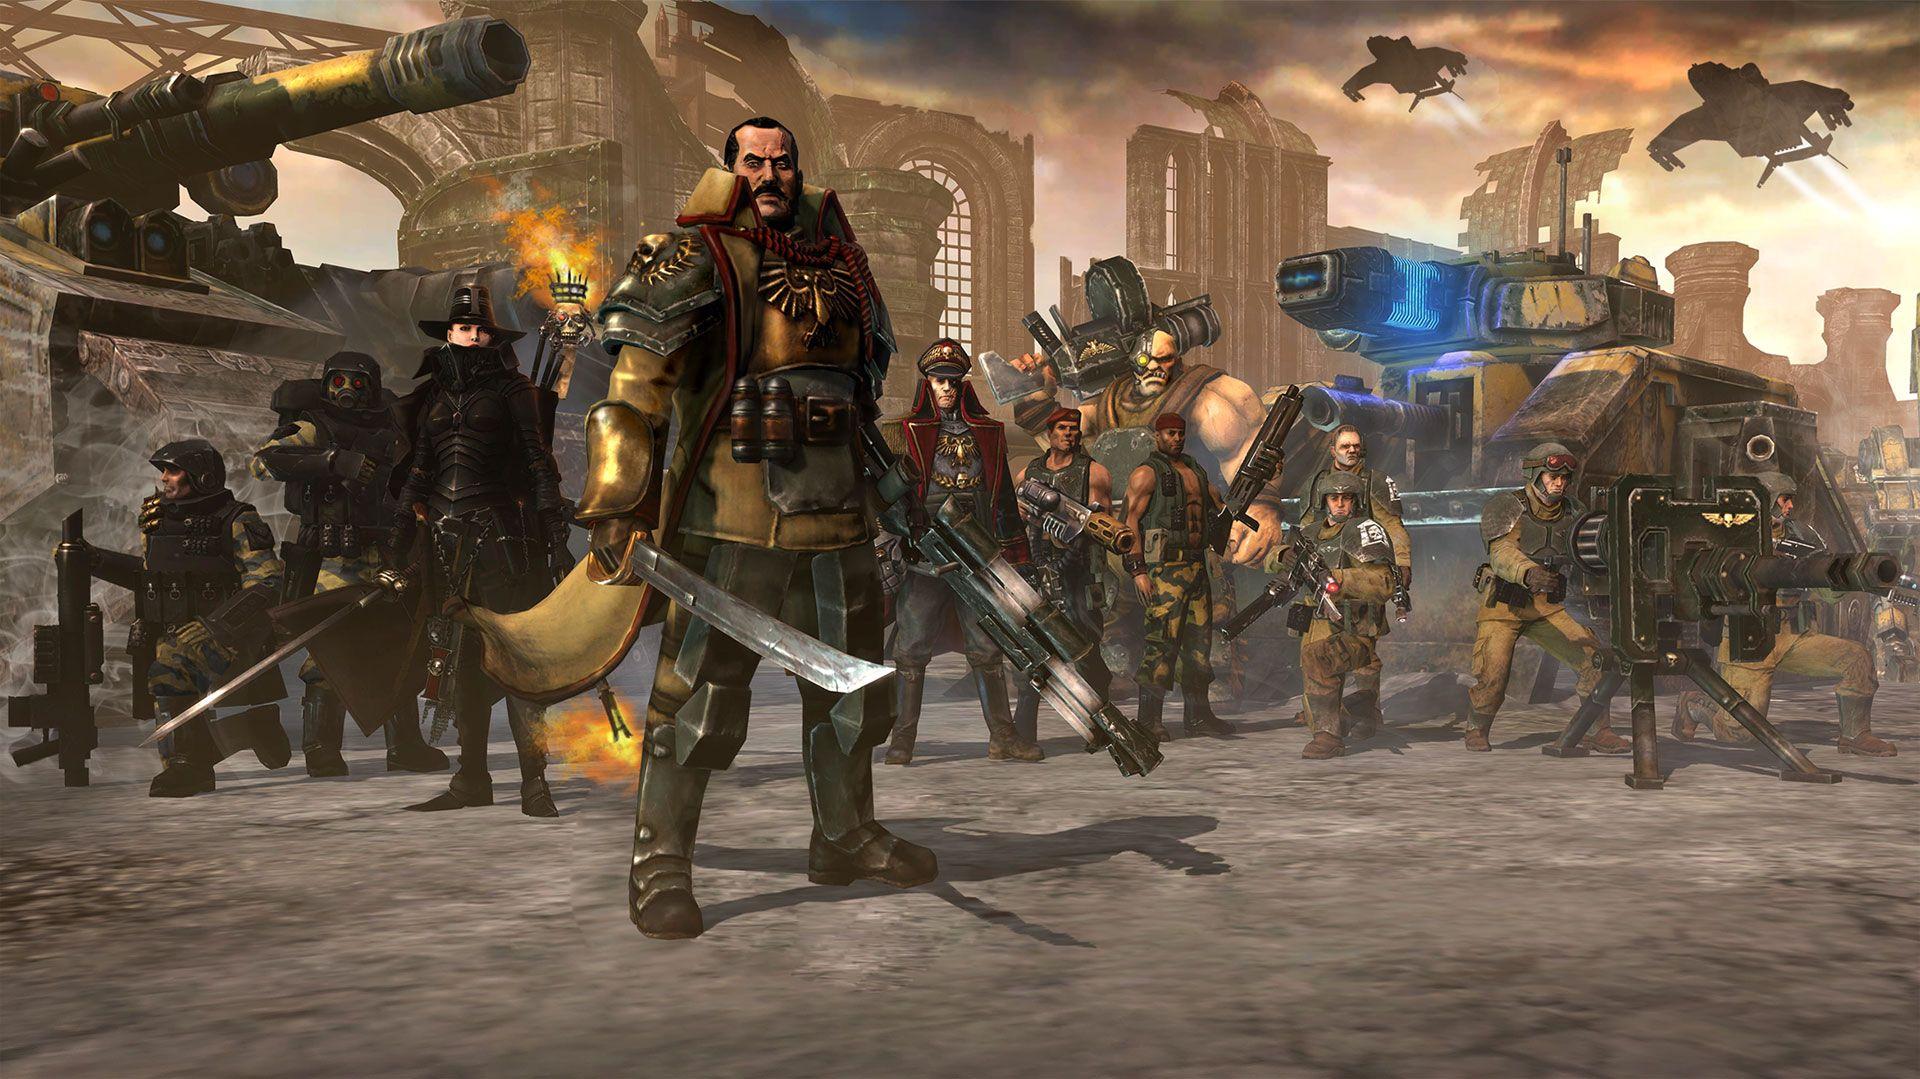 40k Cadian Army Google Search Warhammer Warhammer 40k Warhammer 40k Artwork